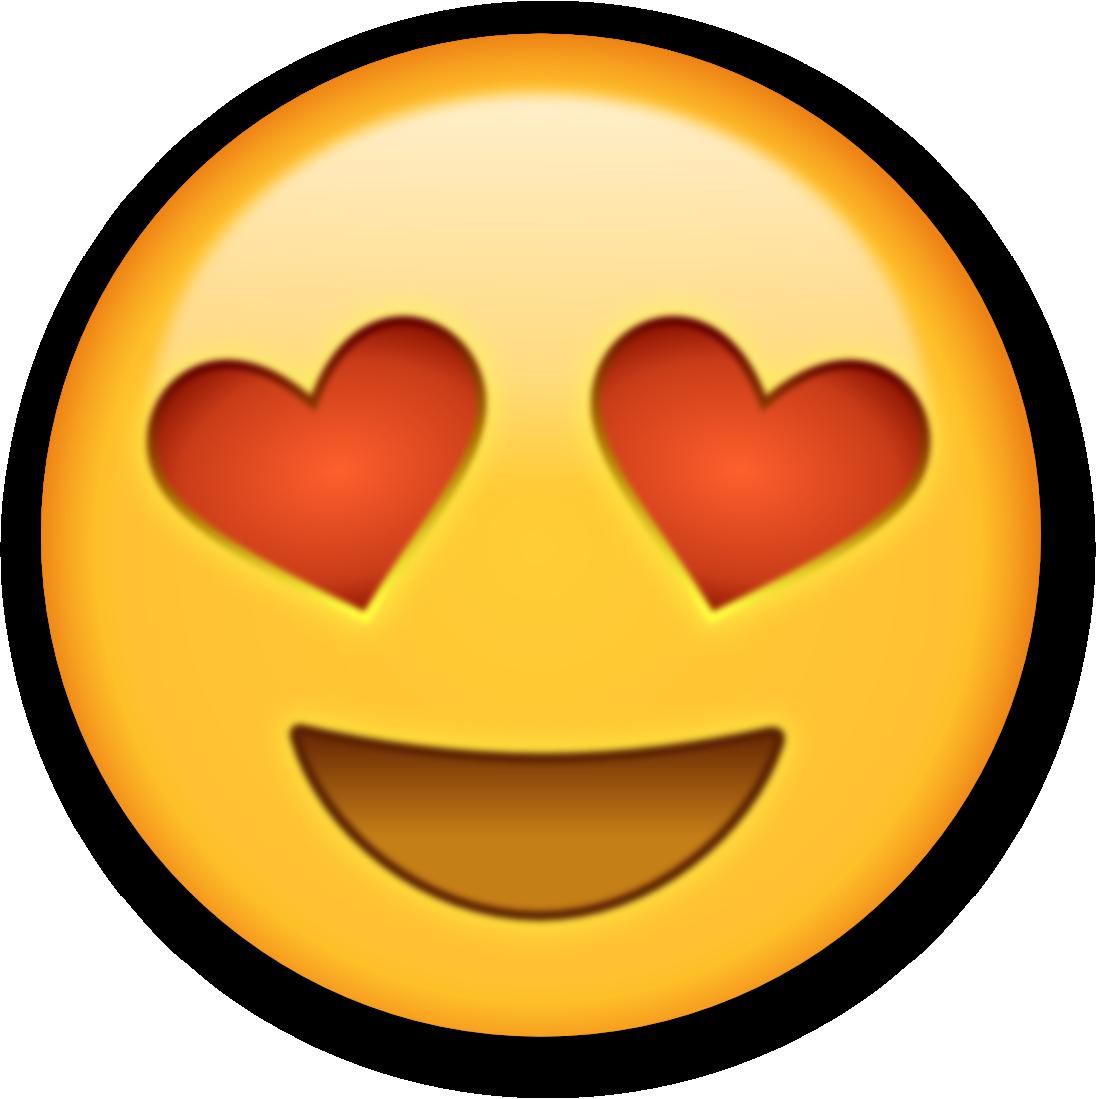 faces clipart free emoji